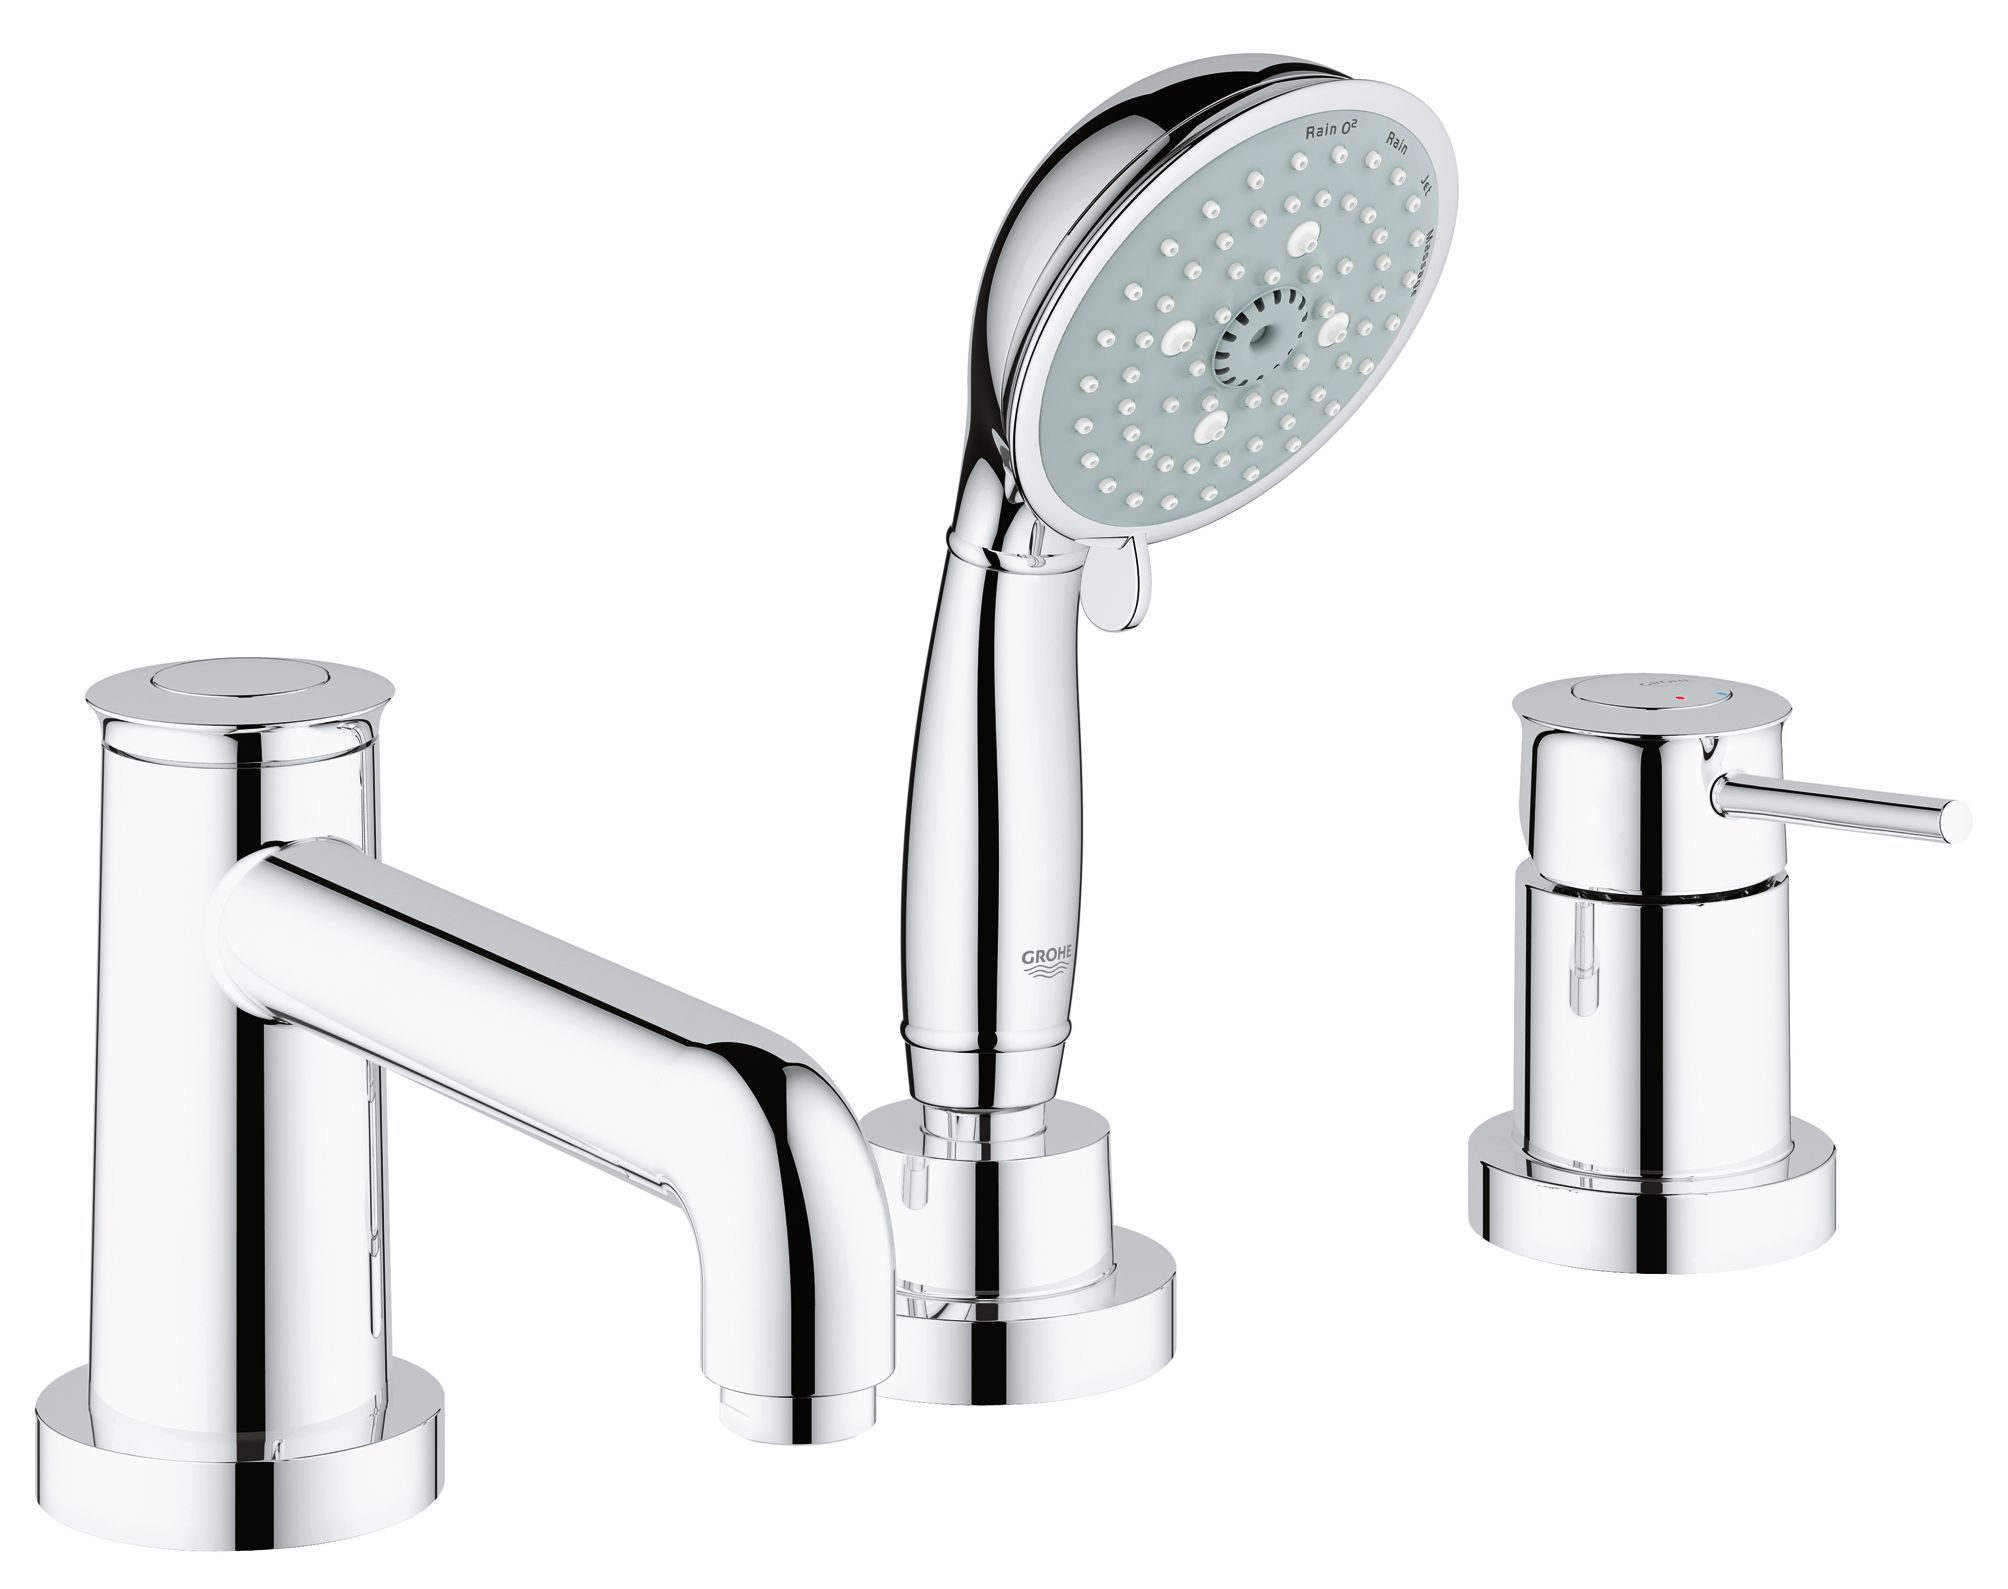 BauClassic 3-hole bath combination